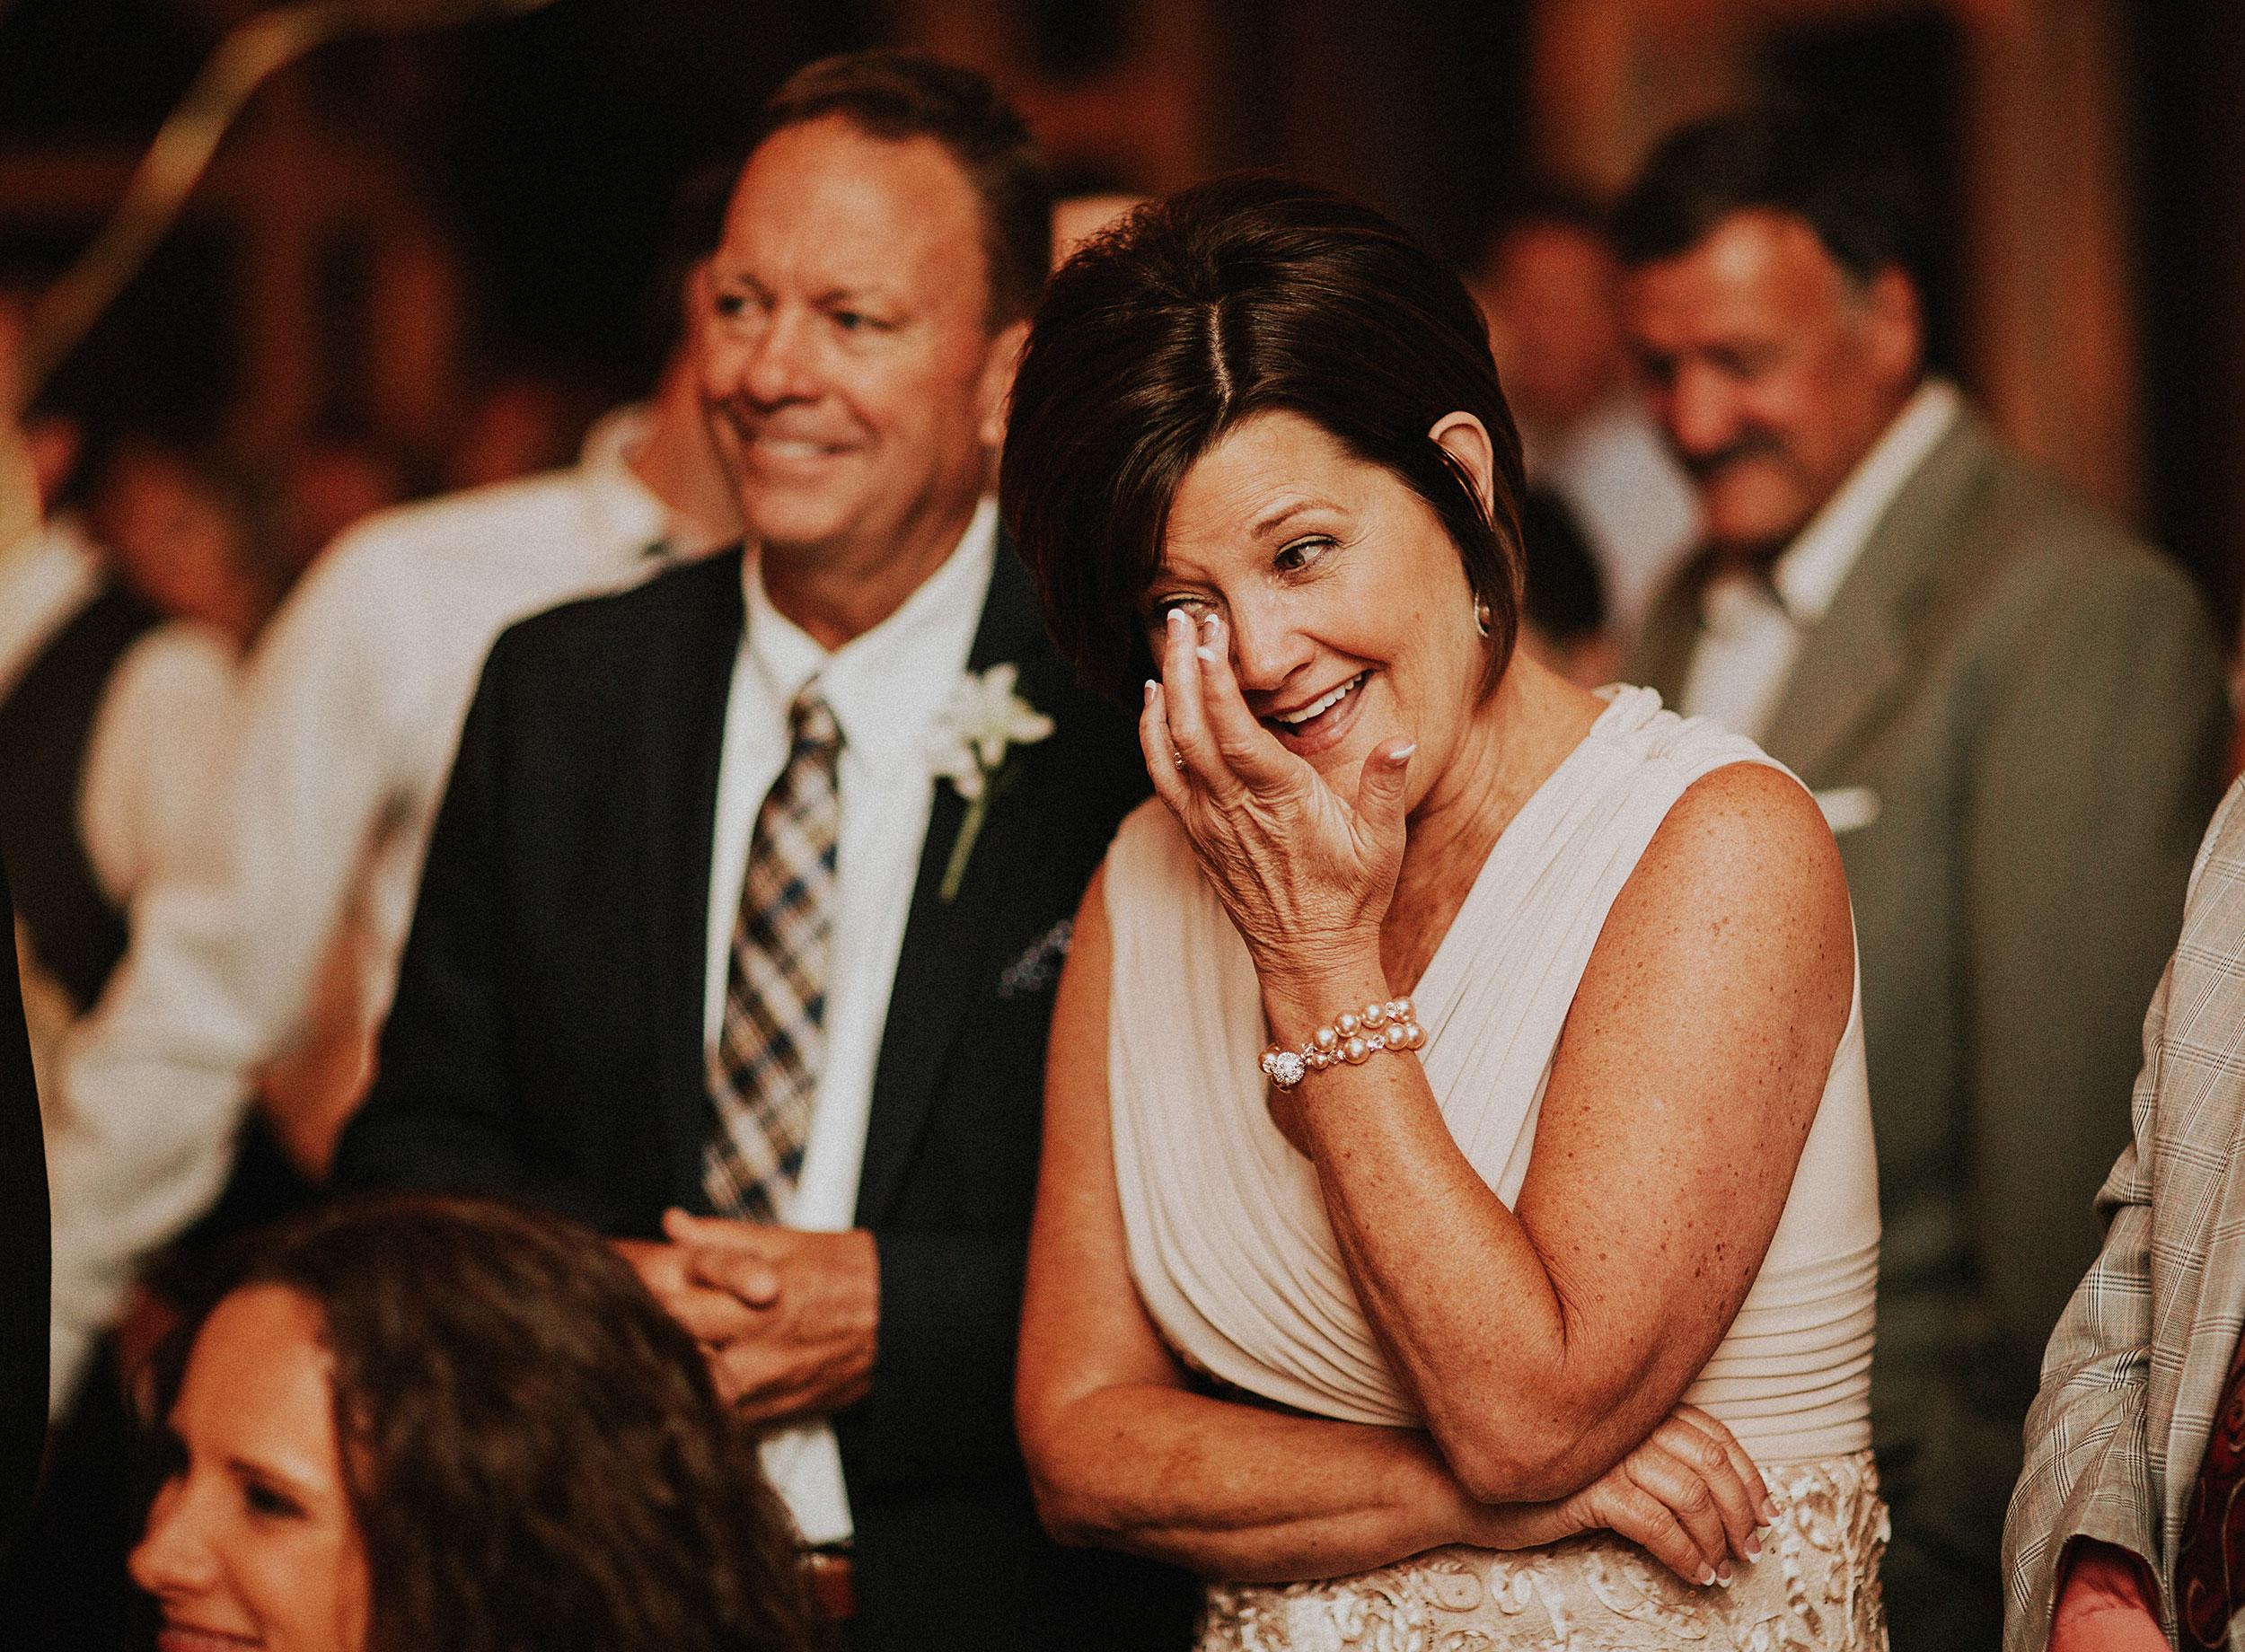 olmsted-wedding-louisville-kentucky-040.JPG